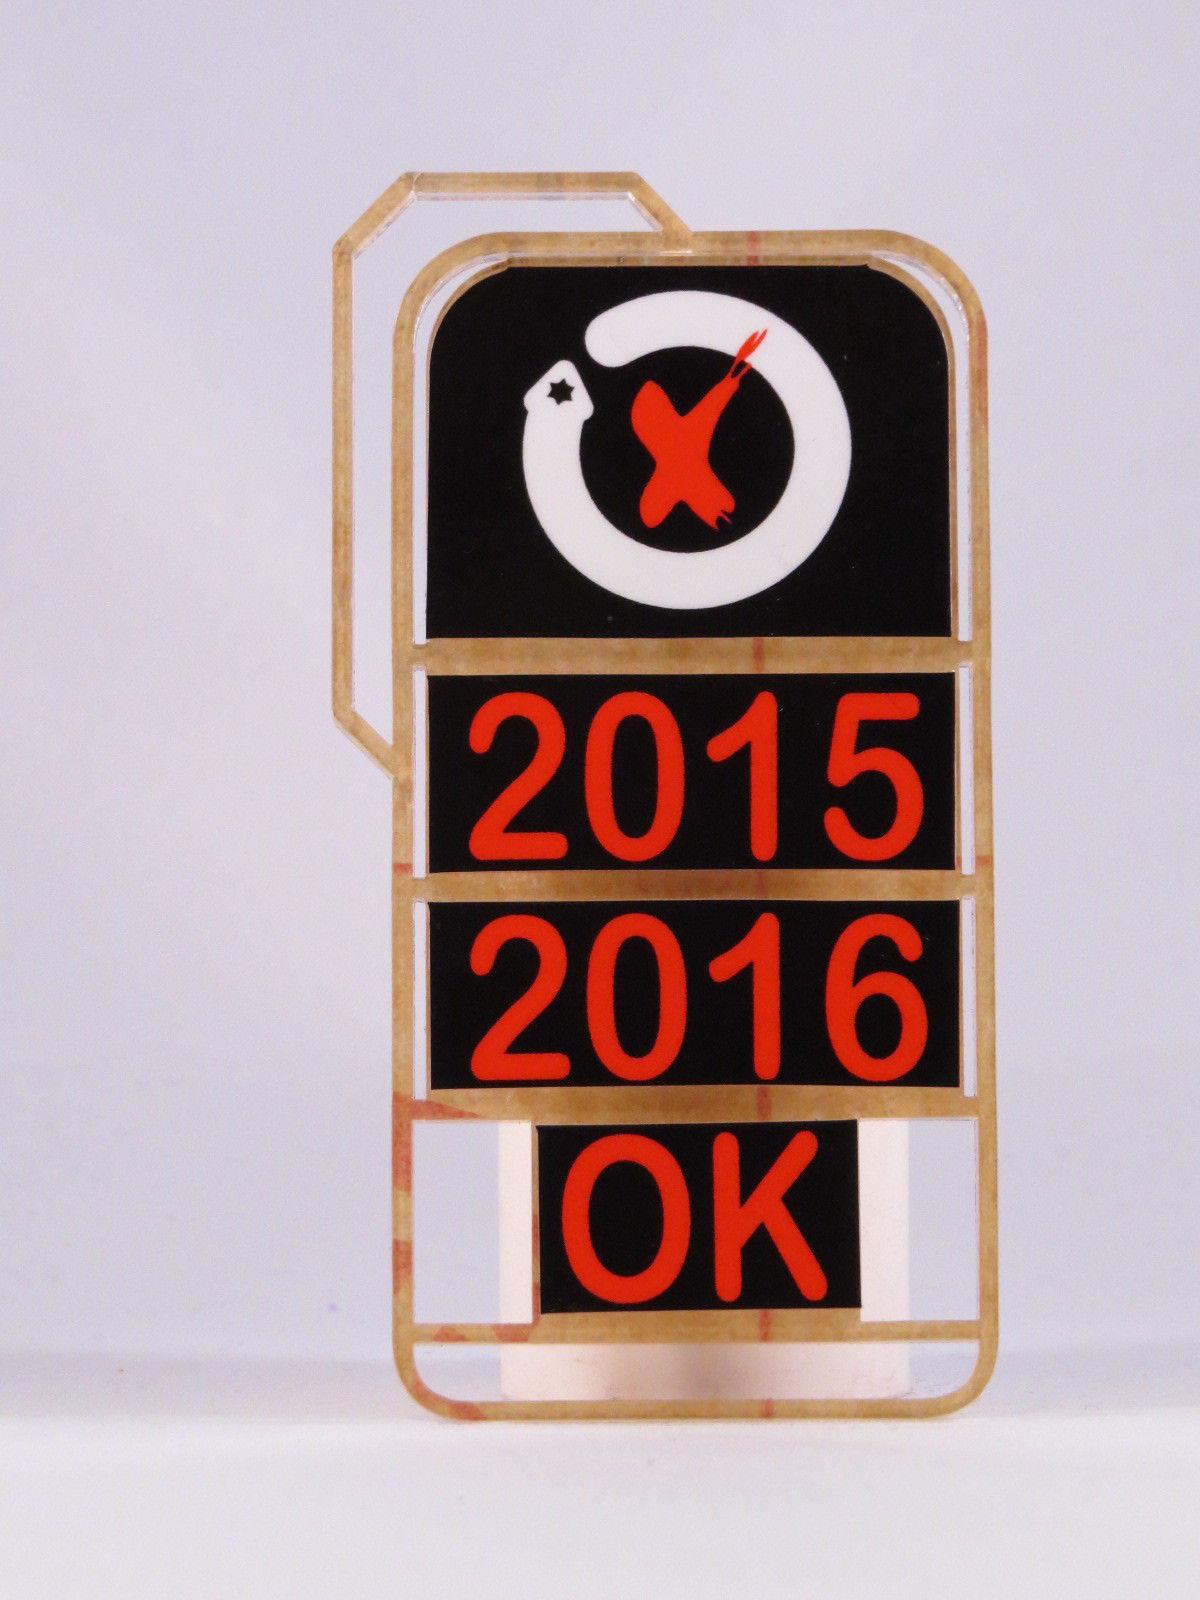 MINICHAMPS JORGE LORENZO PITBOARDS 2015 - 2016 OK SCALA 1/12 NEW